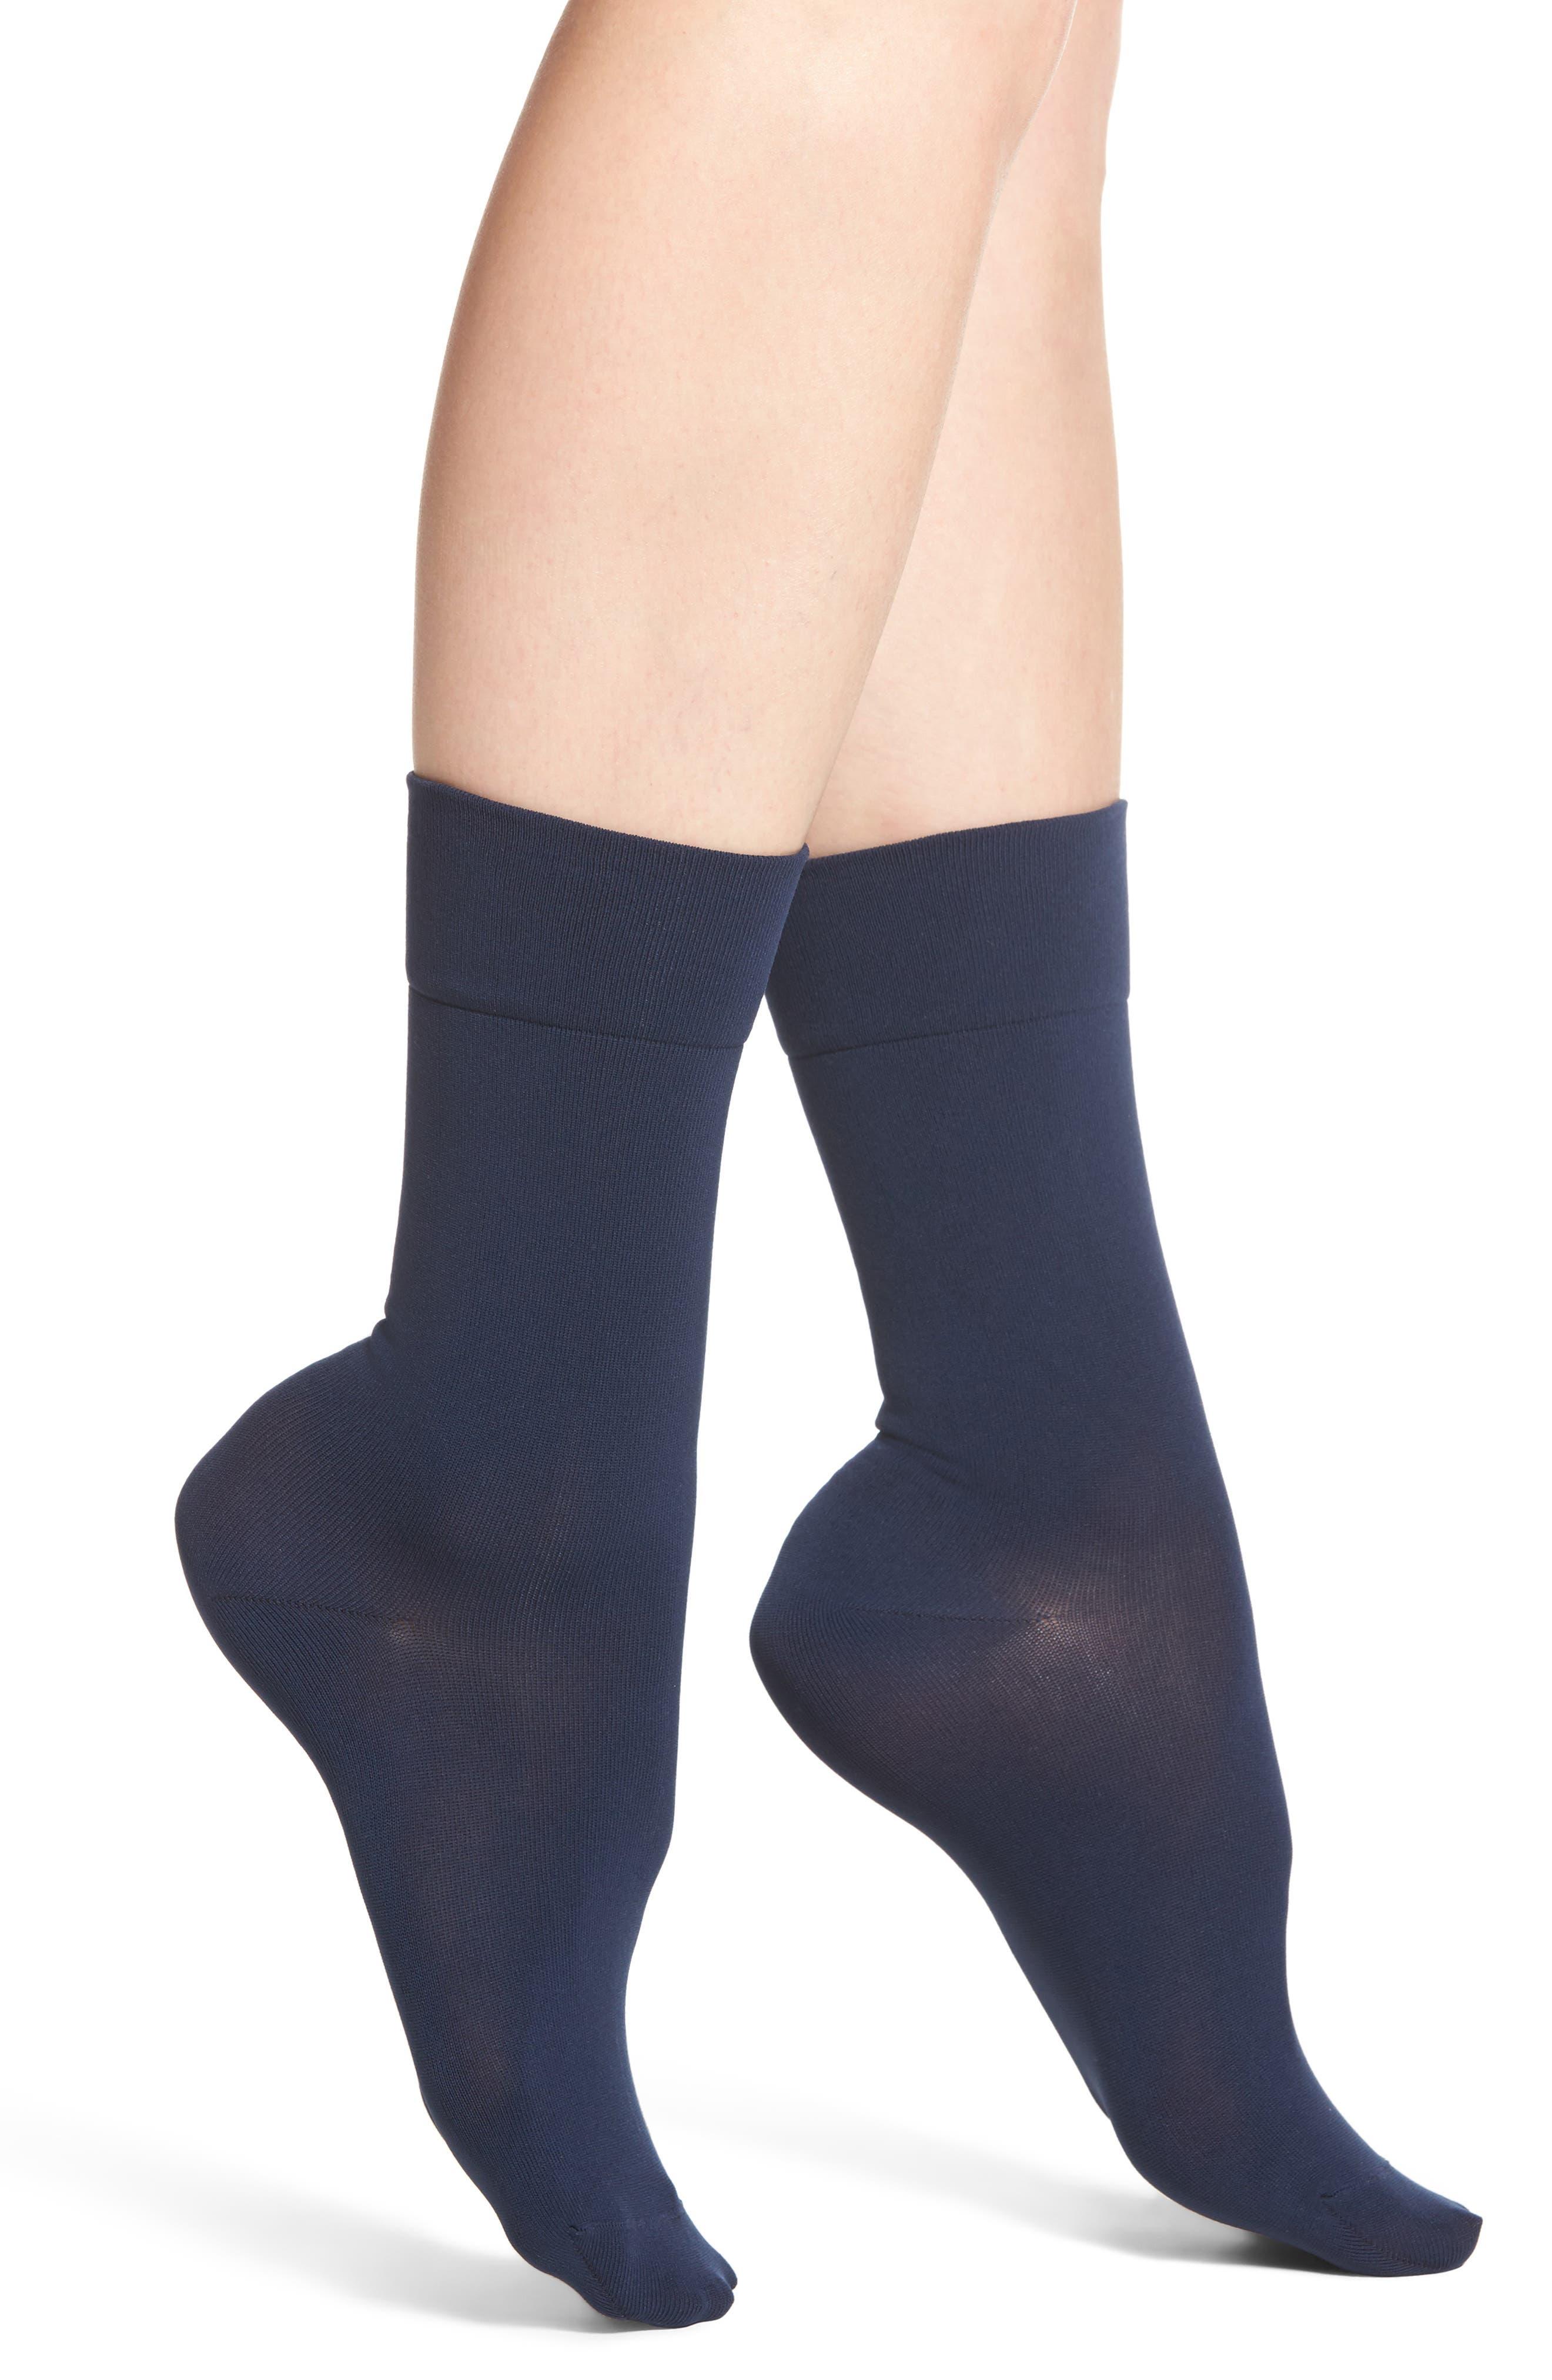 Nordstrom Ultra Sleek Crew Socks